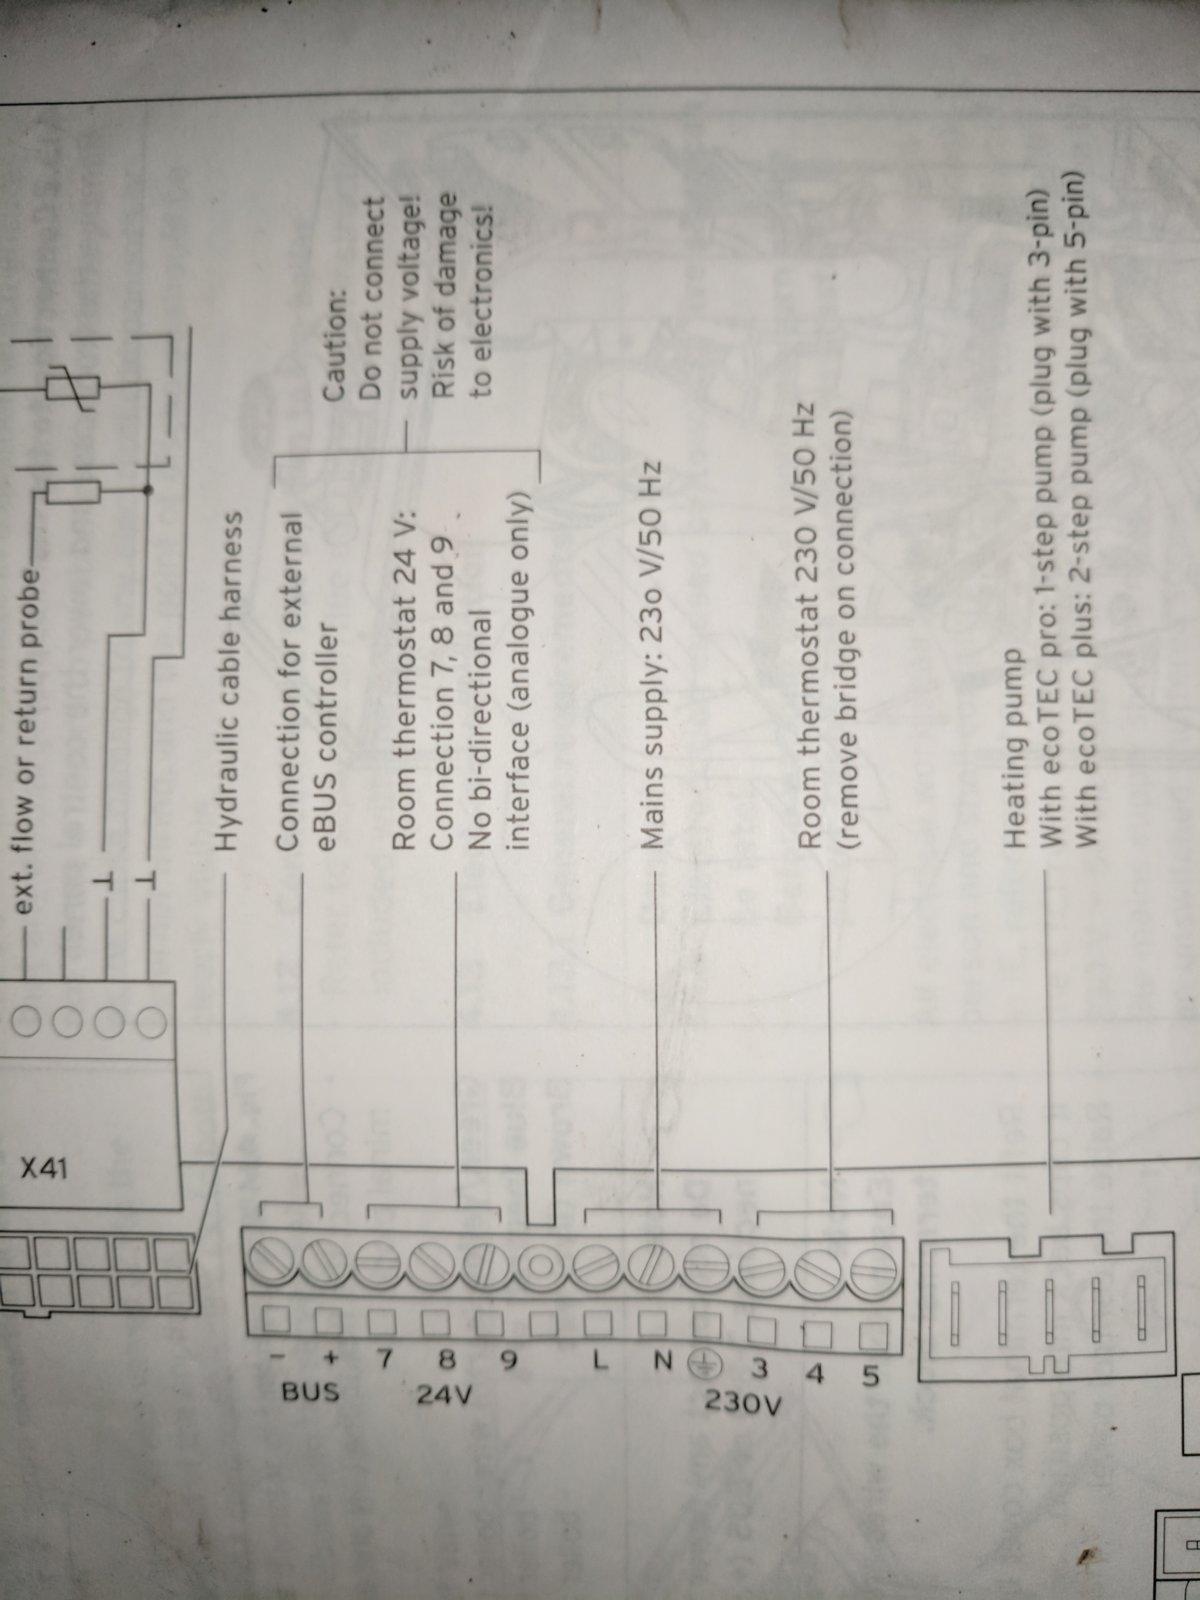 Zm 6075 Port Valve Wiring Diagram Vaillant Ecotec 831 Combi On 2 Zone Download Diagram